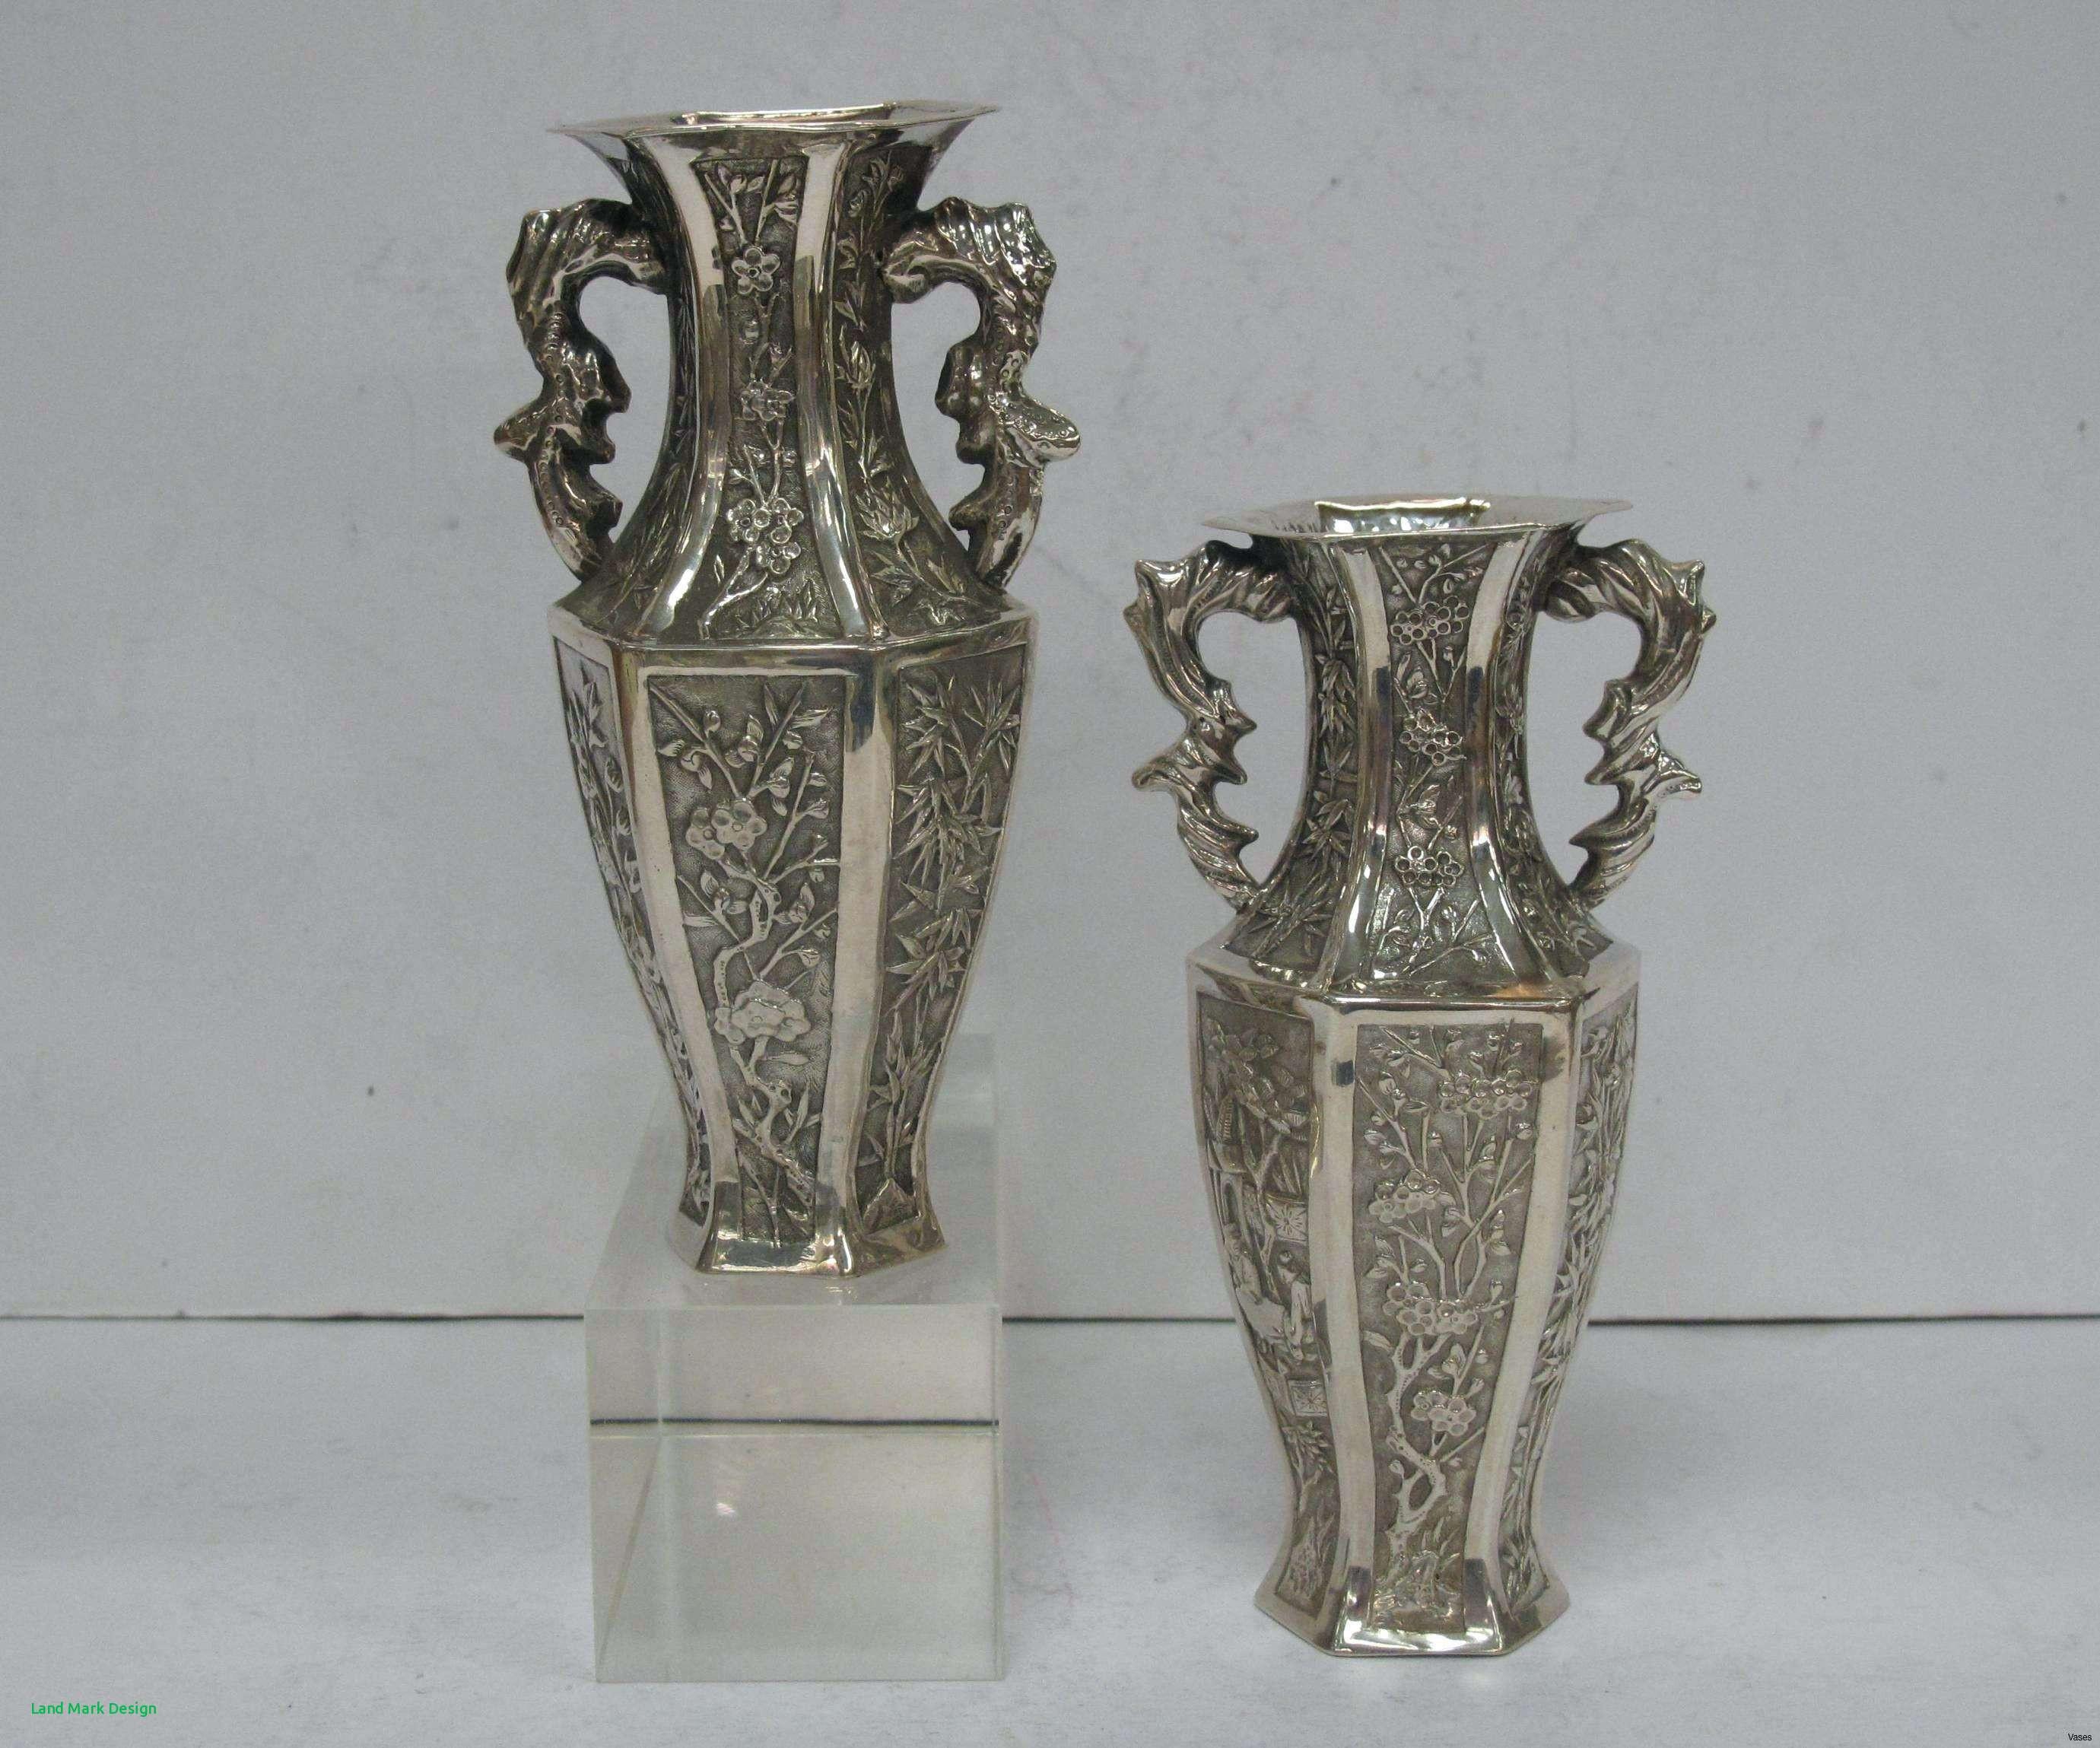 green glass vases bulk of unique crystal vase awards beginneryogaclassesnear me in 8253h vases bulk silver square glass cube vase with metallic band 6x6i 0d vases bulk silver